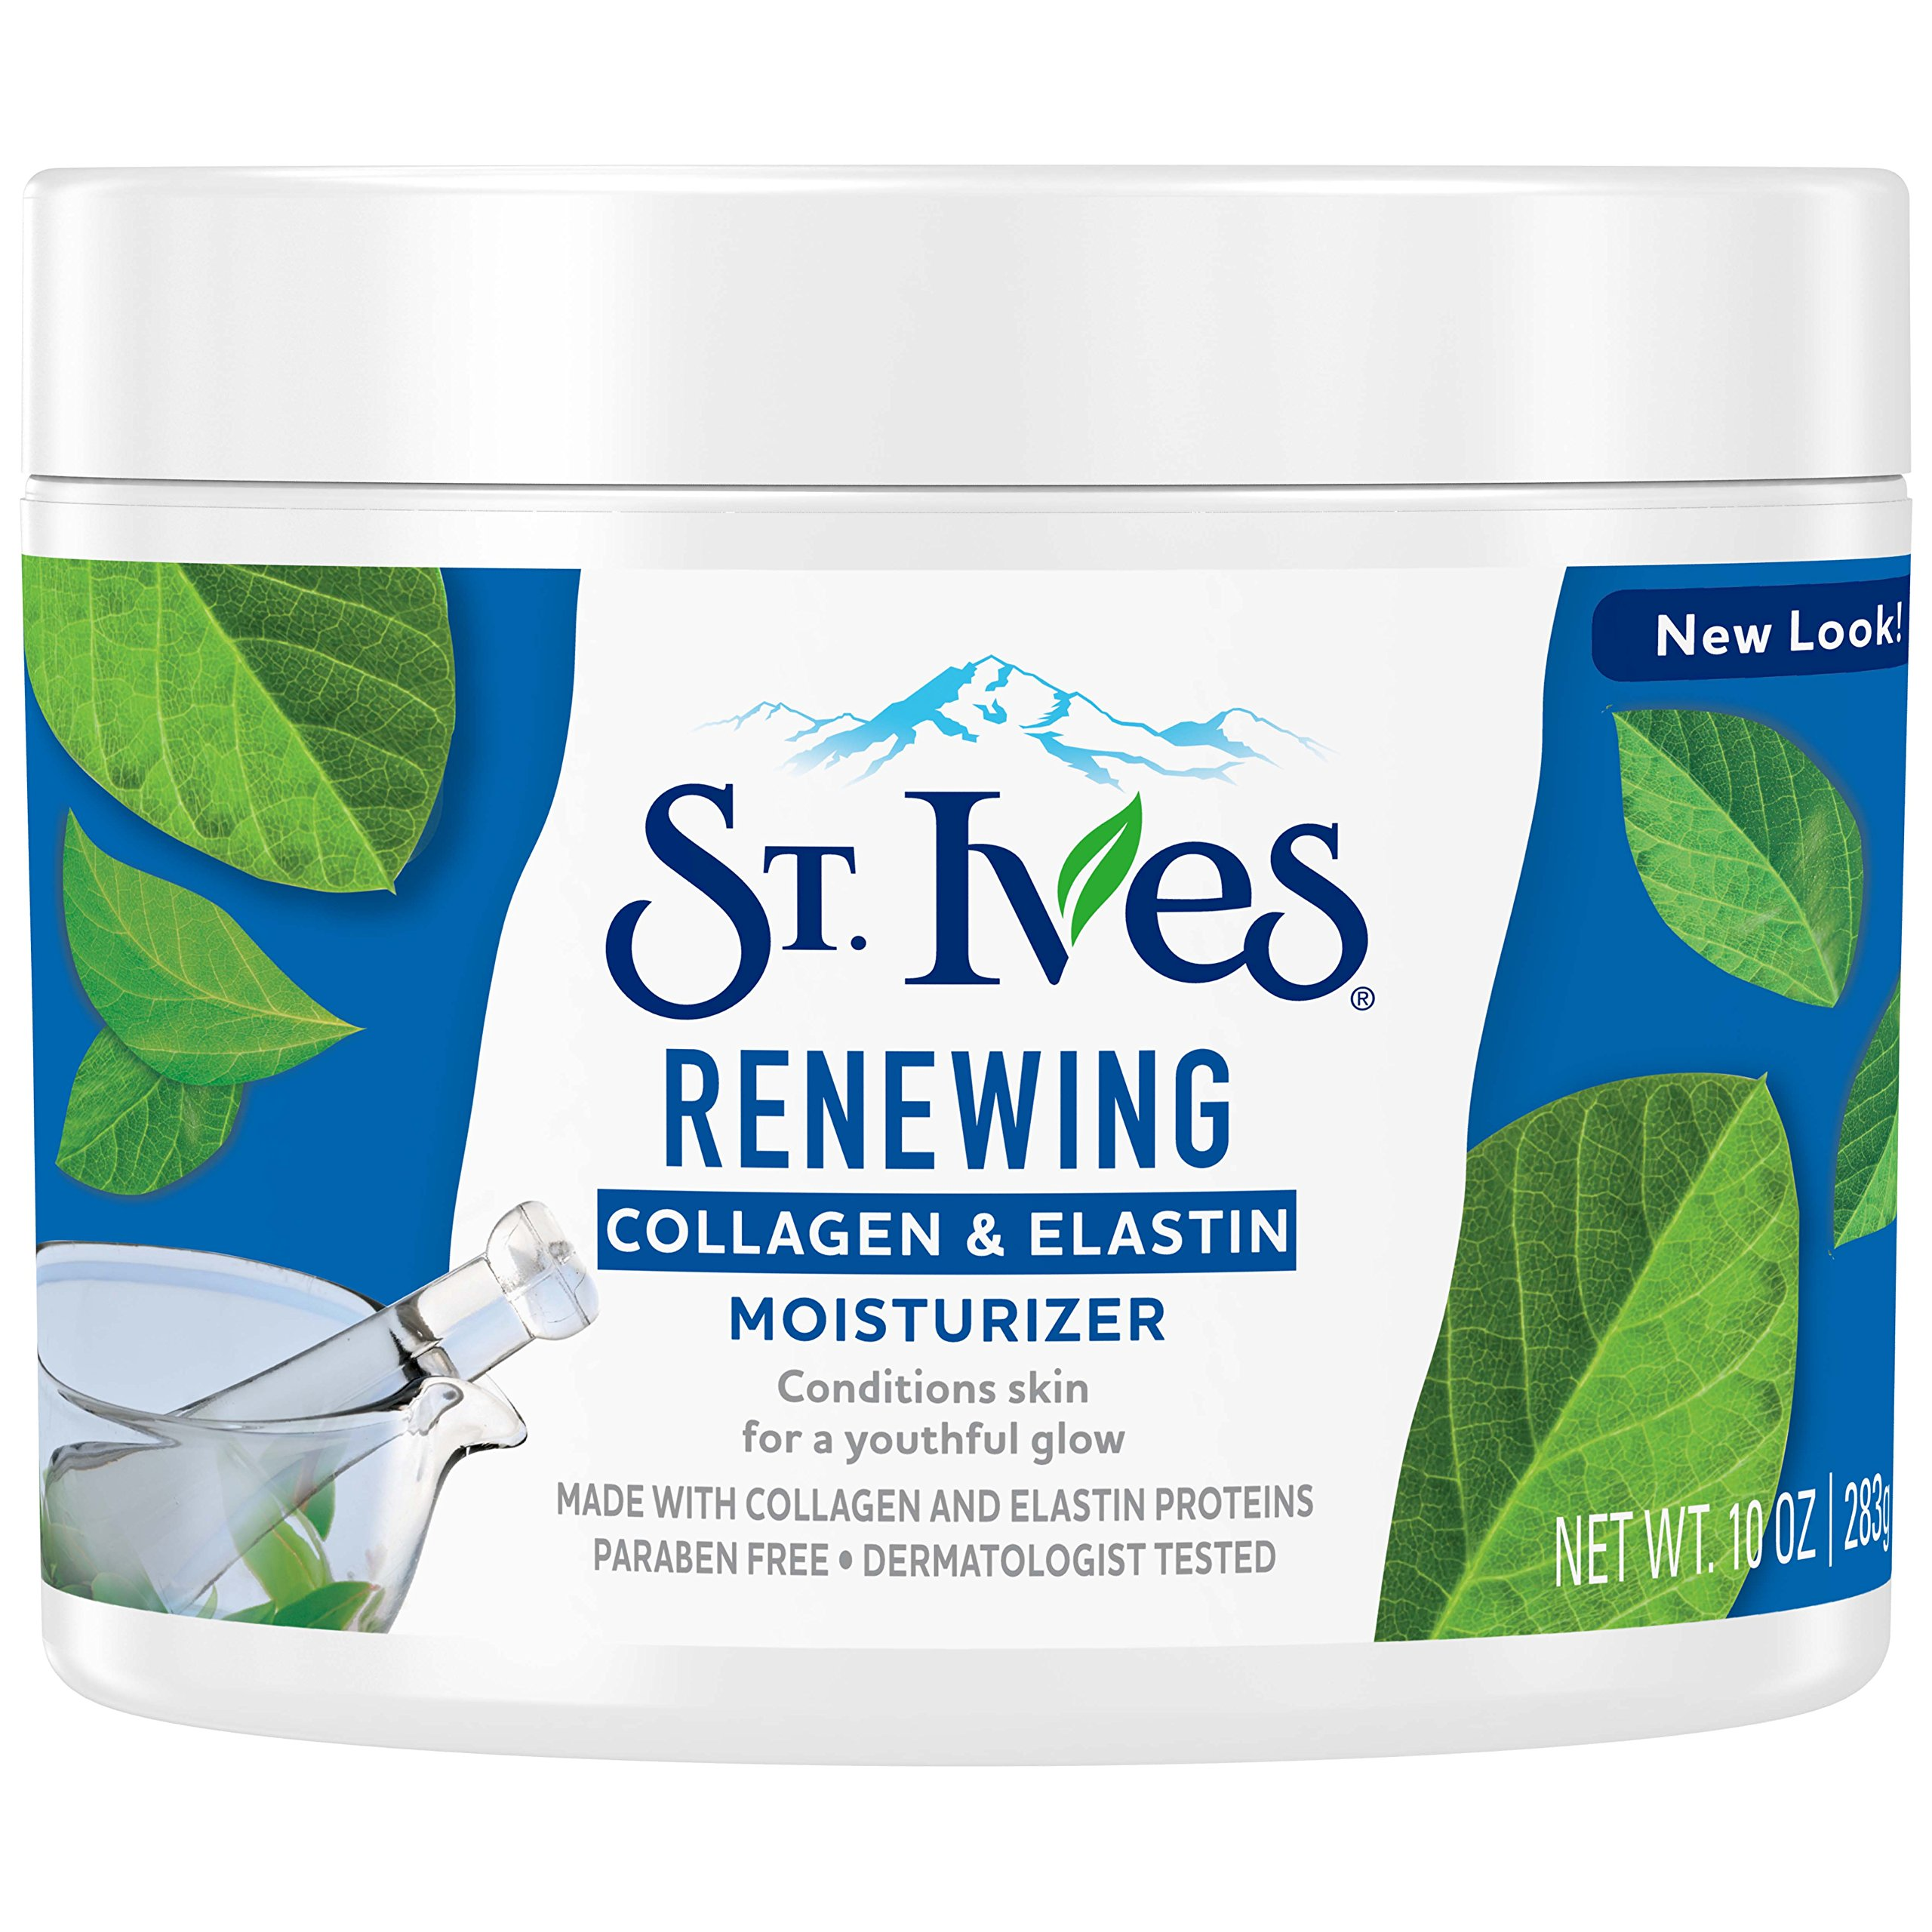 St. Ives Renewing Facial Moisturizer, Collagen Elastin, 10 oz